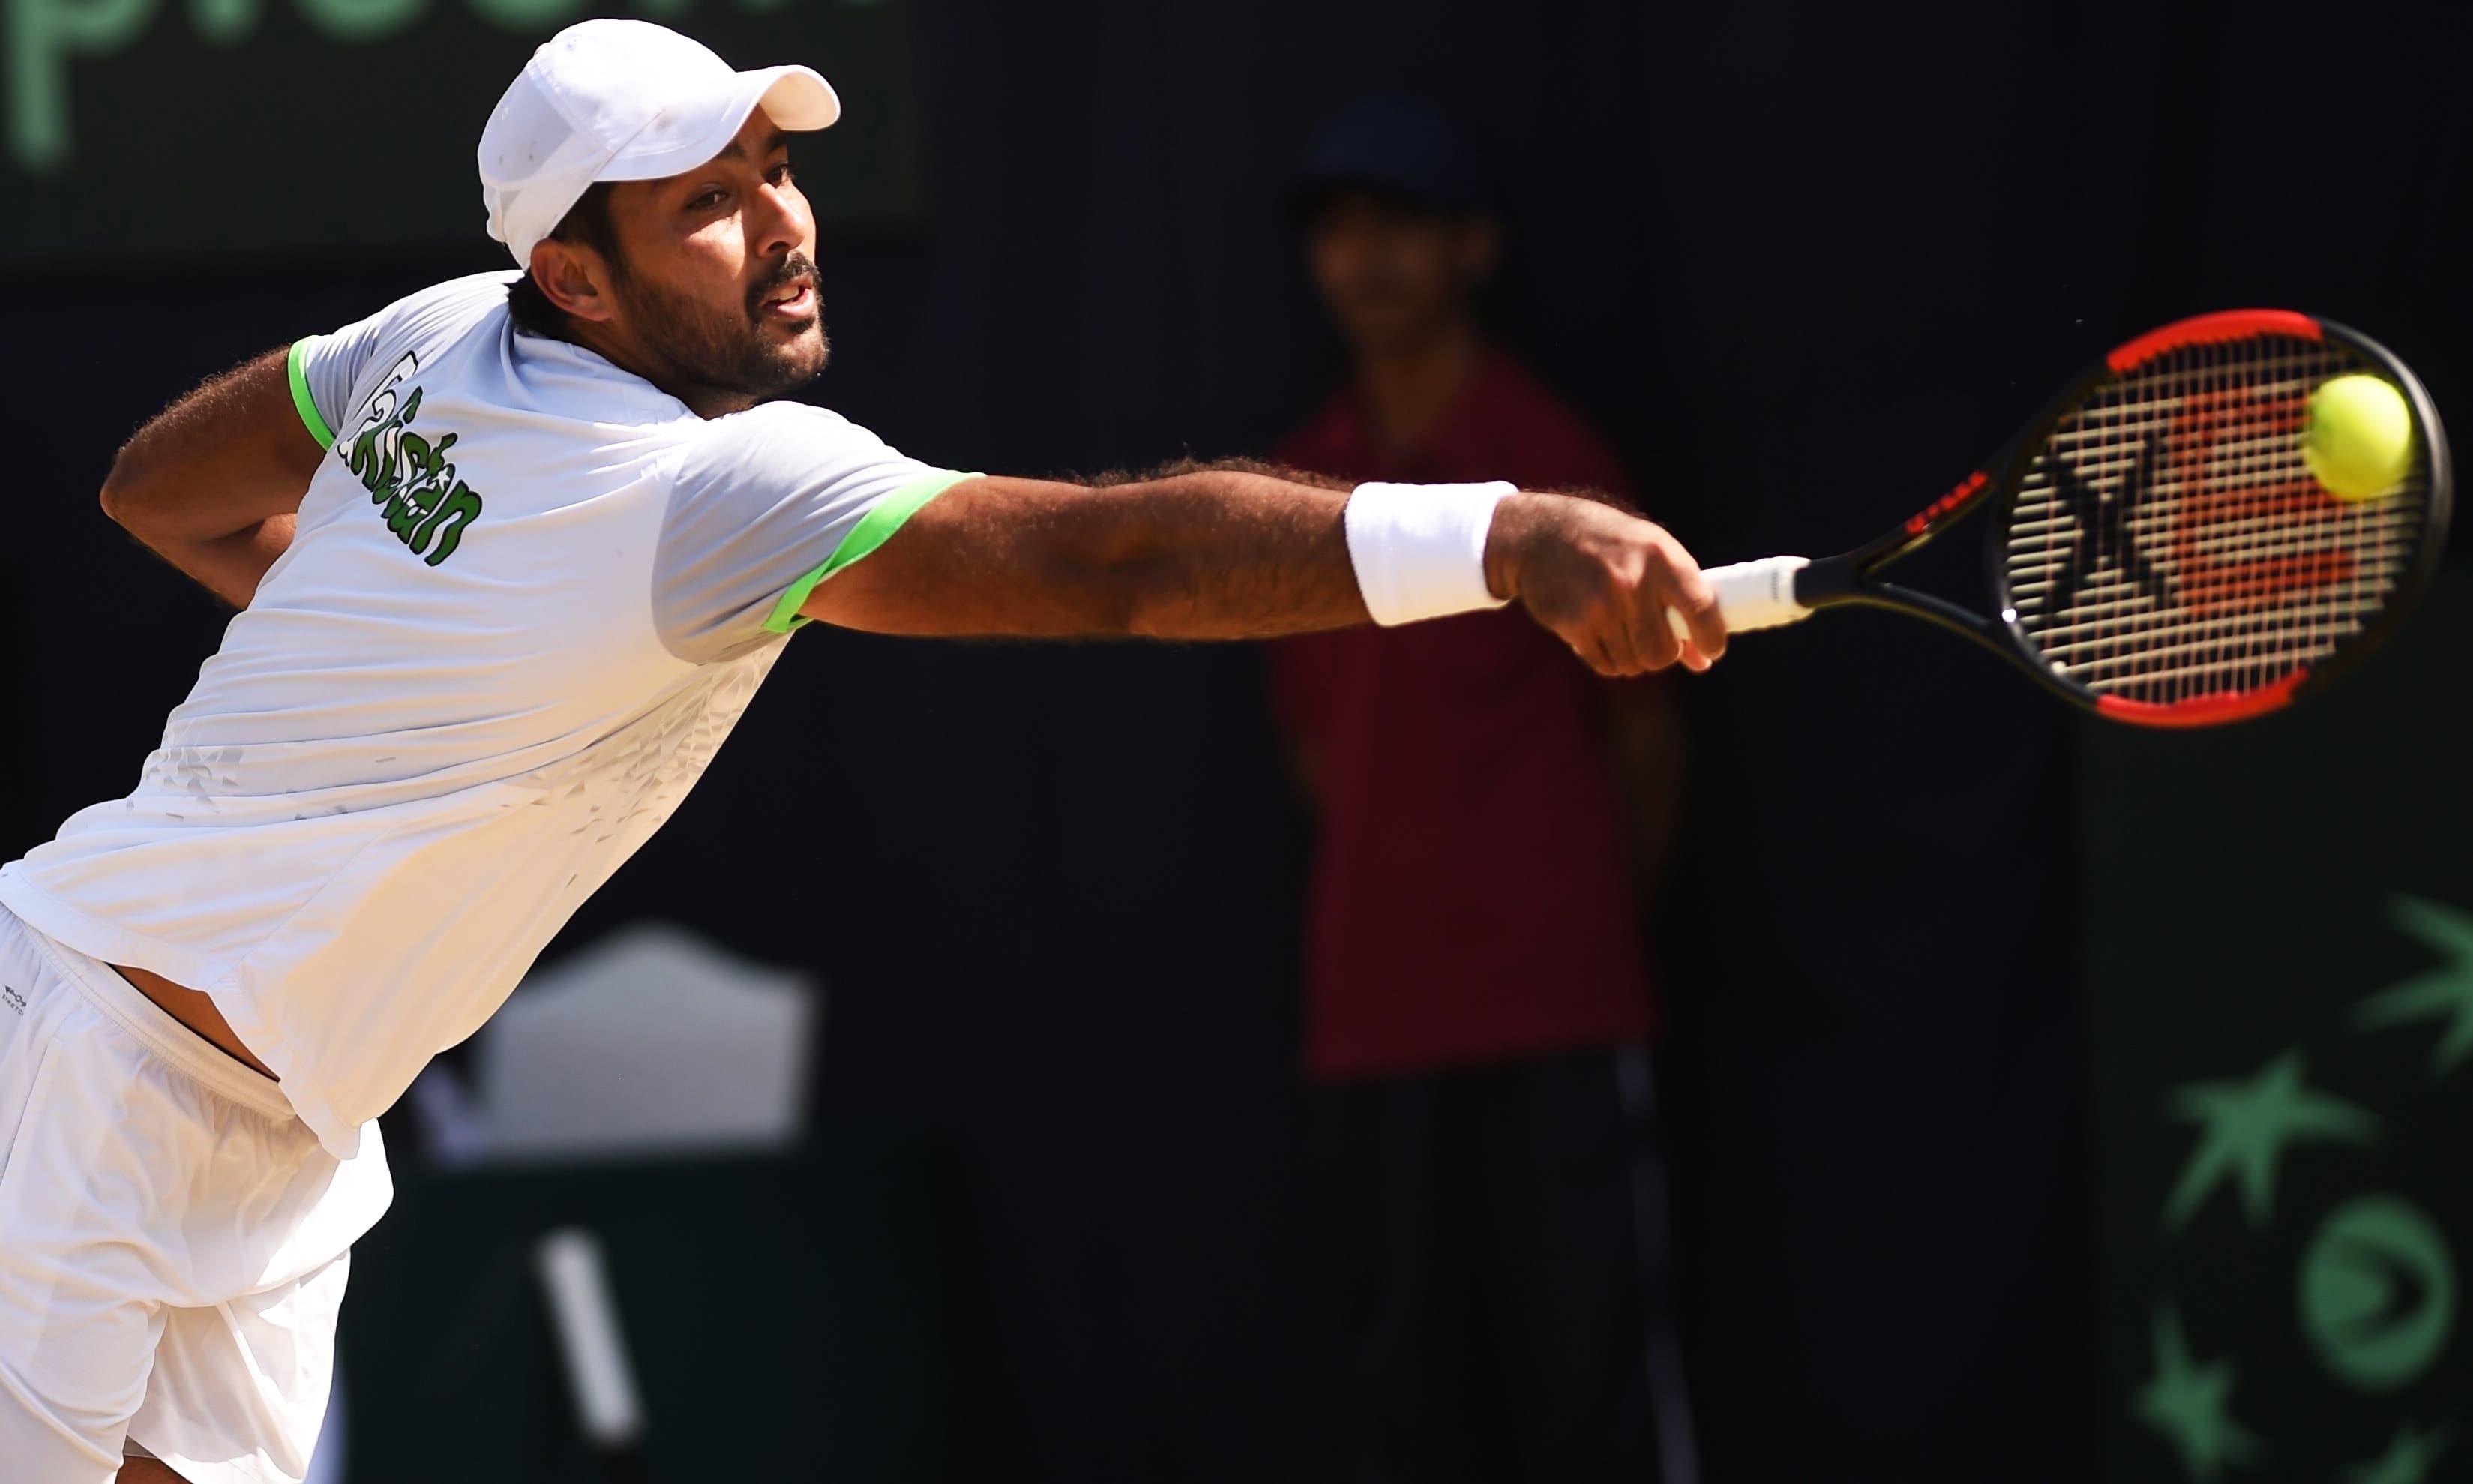 Pakistani tennis player Aisam Qureshi. — AFP/File